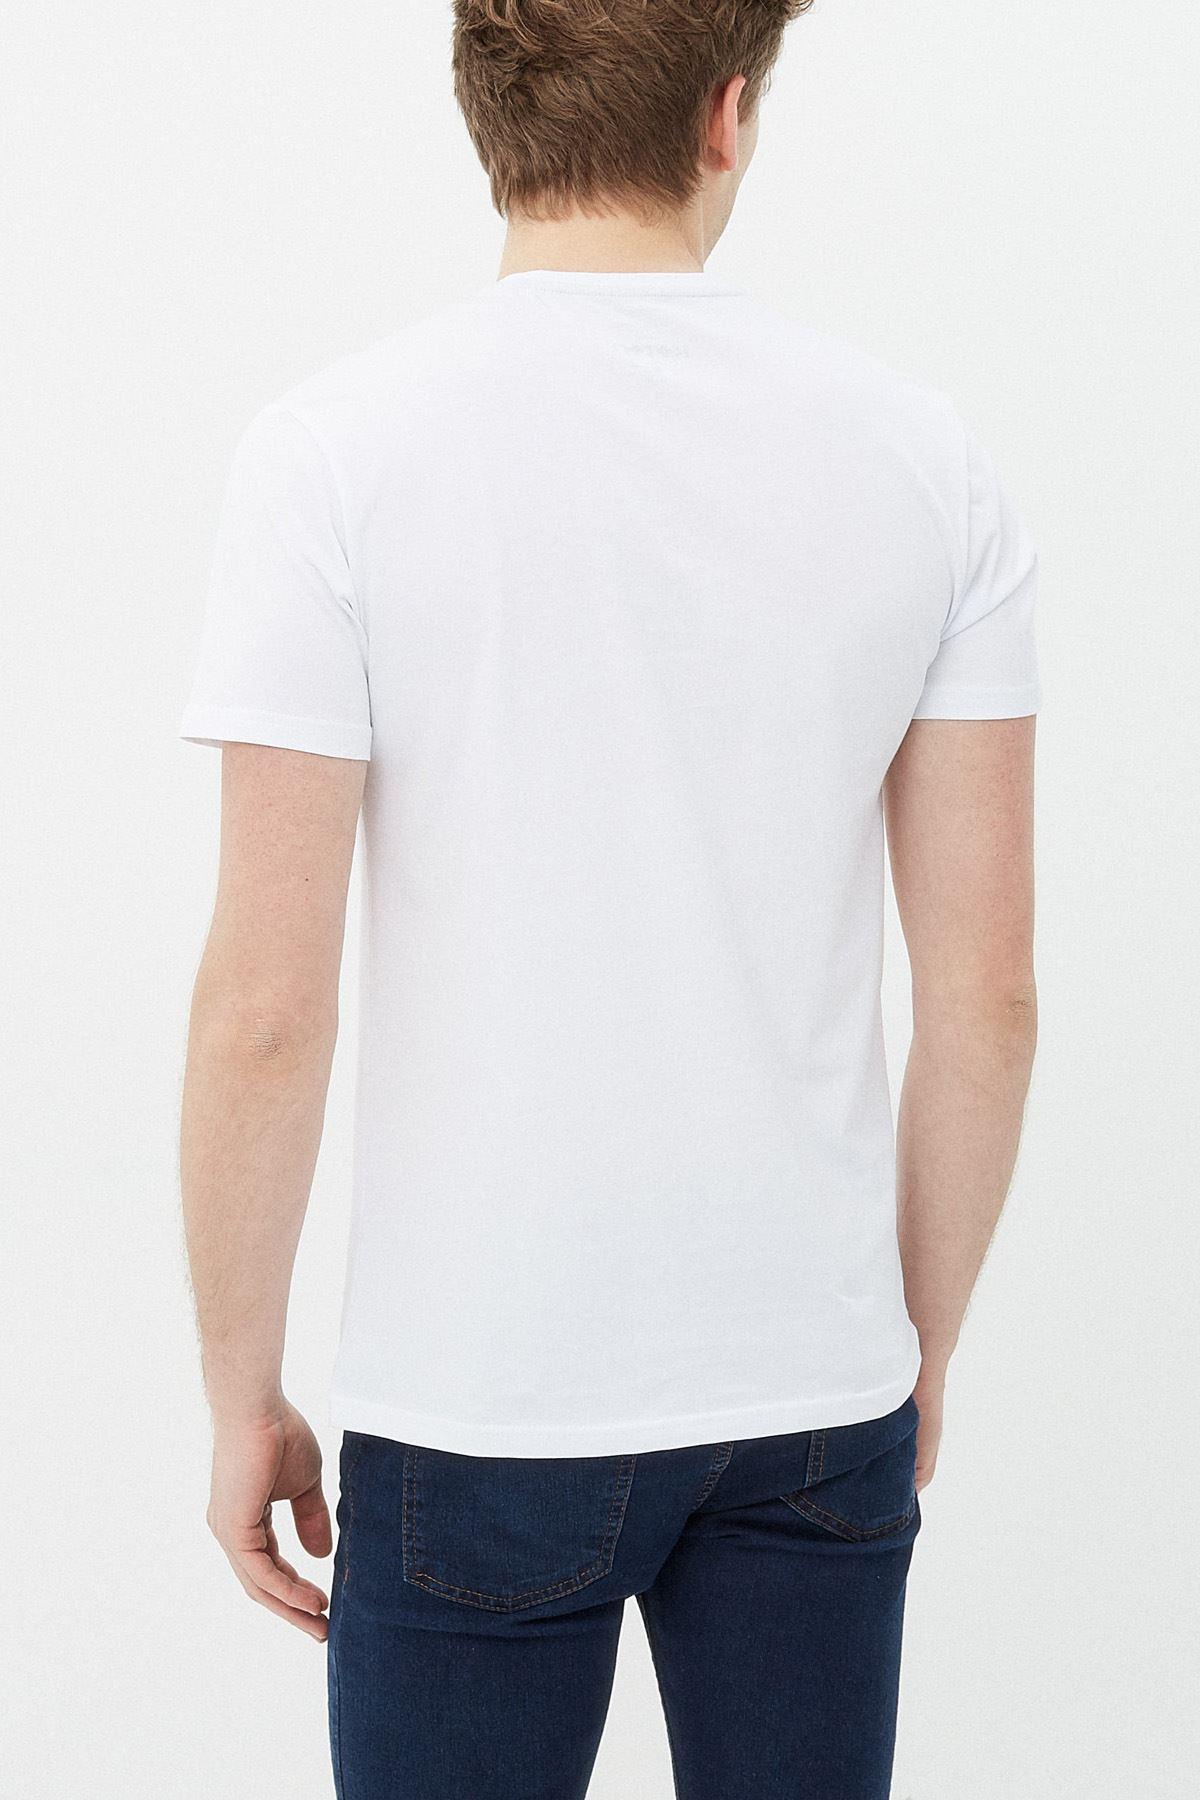 Naruto Anime 05 Beyaz Erkek Tshirt - Tişört